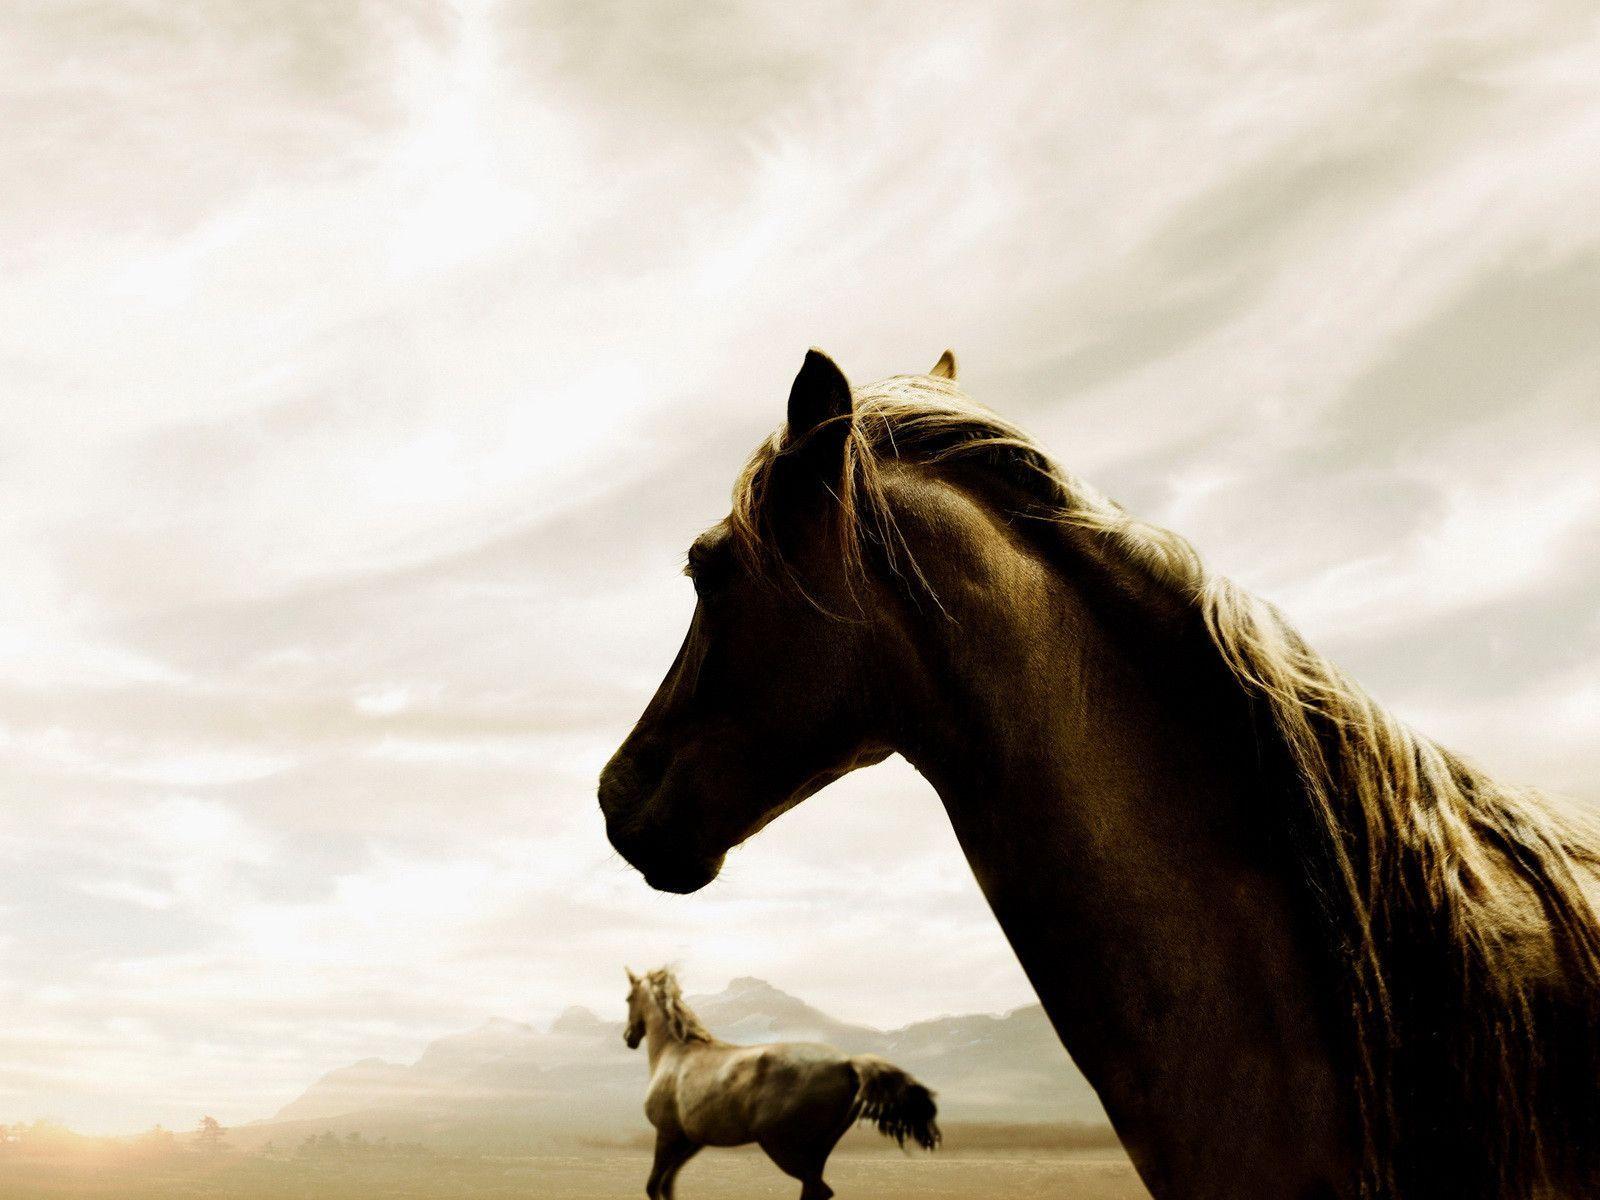 Desktop Wallpaper Gallery Windows 7 Horse Wallpaper For Horses Animals Beautiful Wild Horses